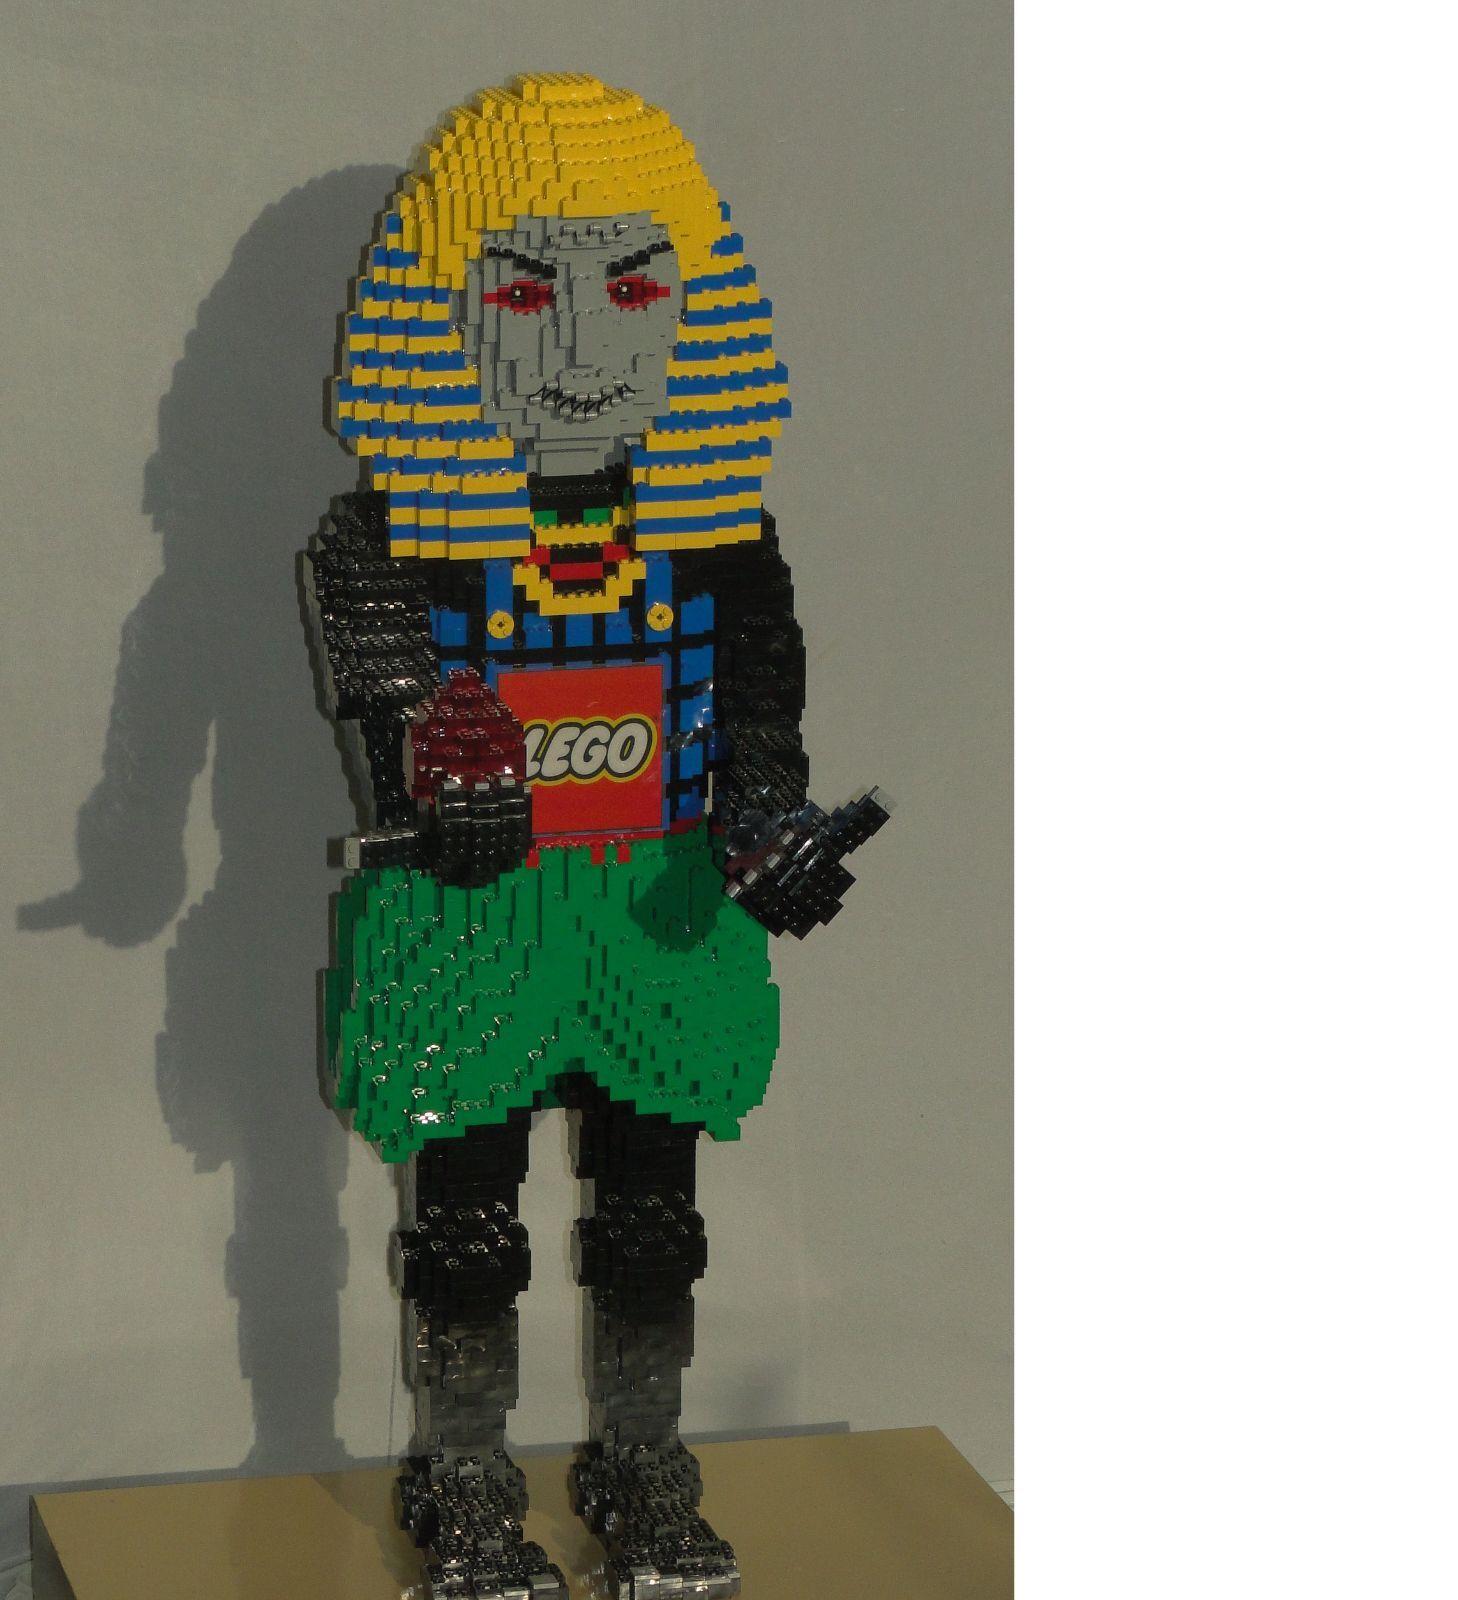 Lego Legoland Grossfigur - Pharao Ägypter mit Sound Sensor 102 cm Figur